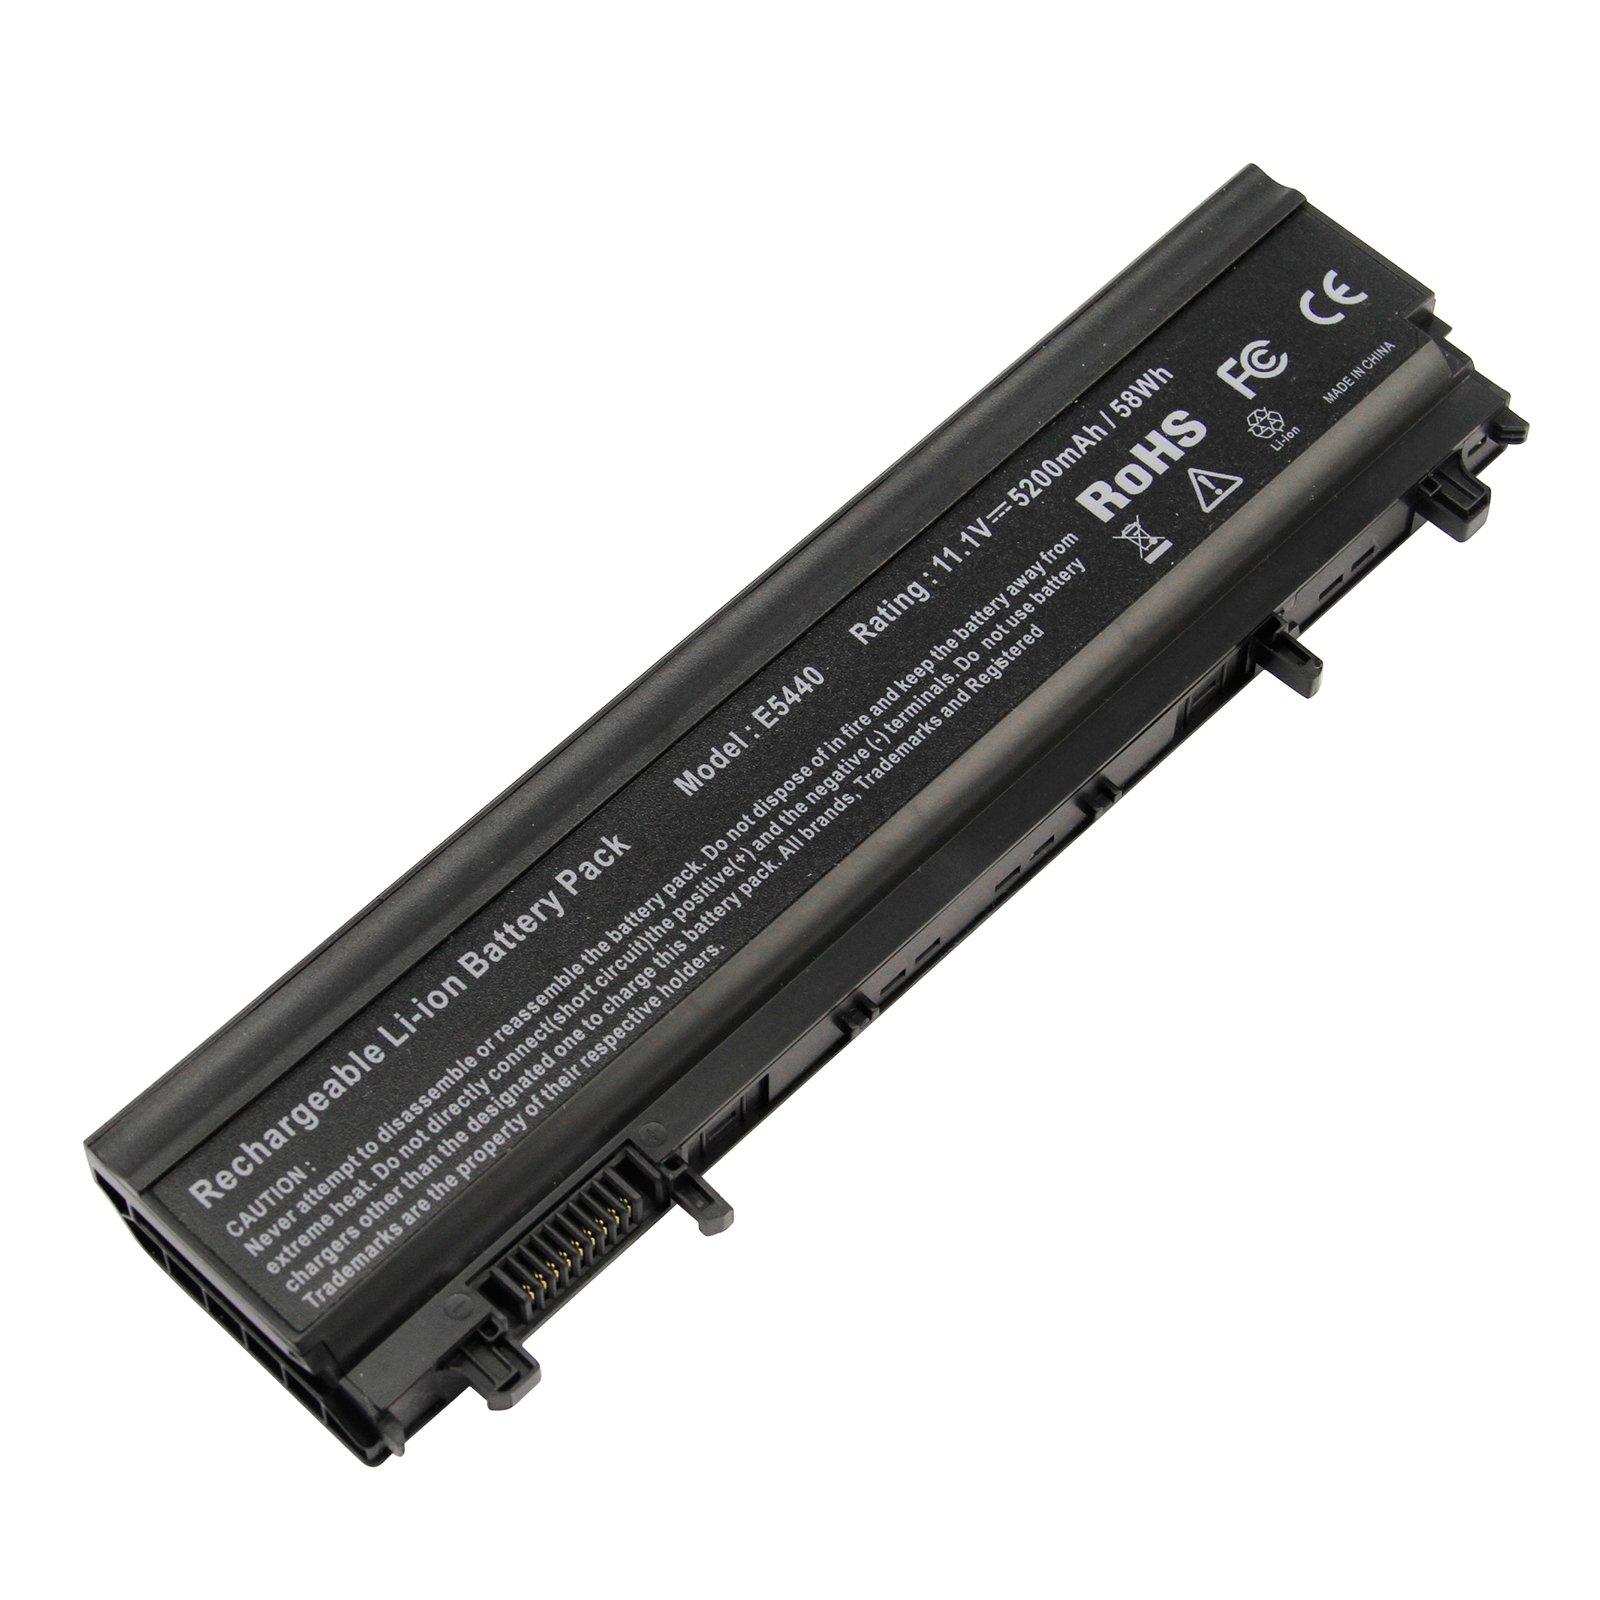 Bateria 5200mAh 11.1V para Dell Latitude E5440 E5540 Series para N5YH9 WGCW6 1N9C0 F49WX 0M7T5F